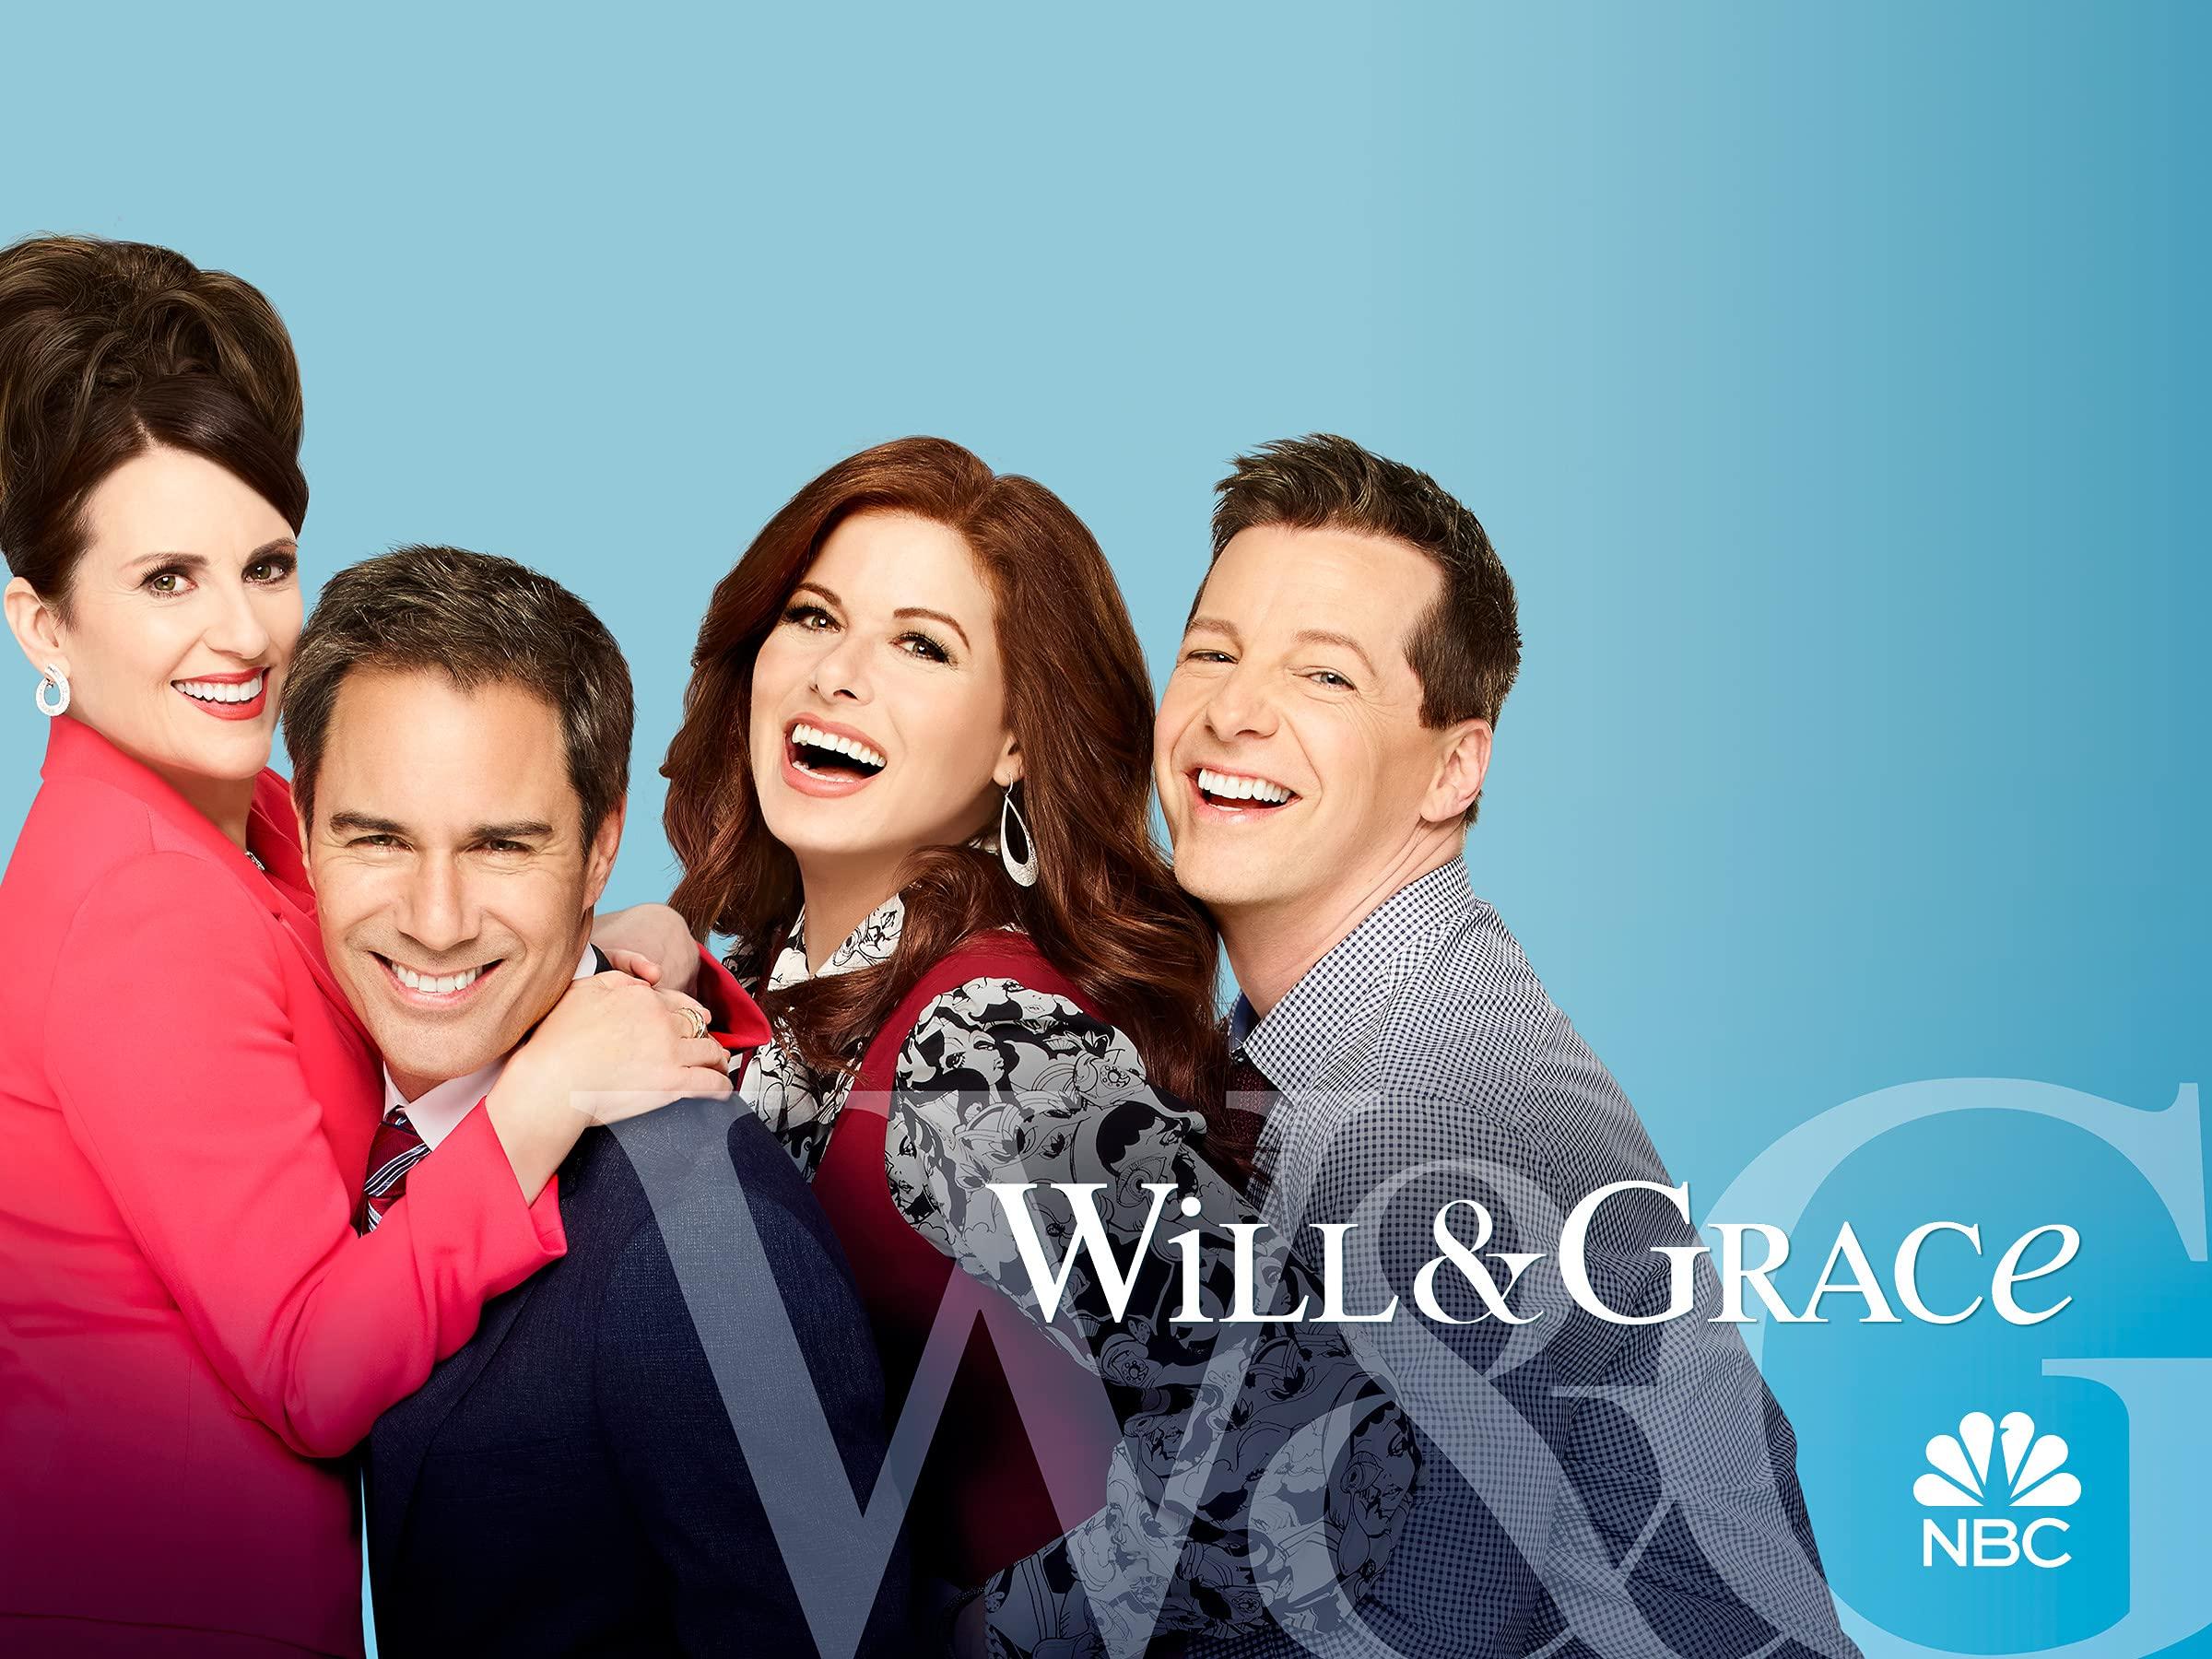 Will & Grace ('17) on Amazon Prime Video UK